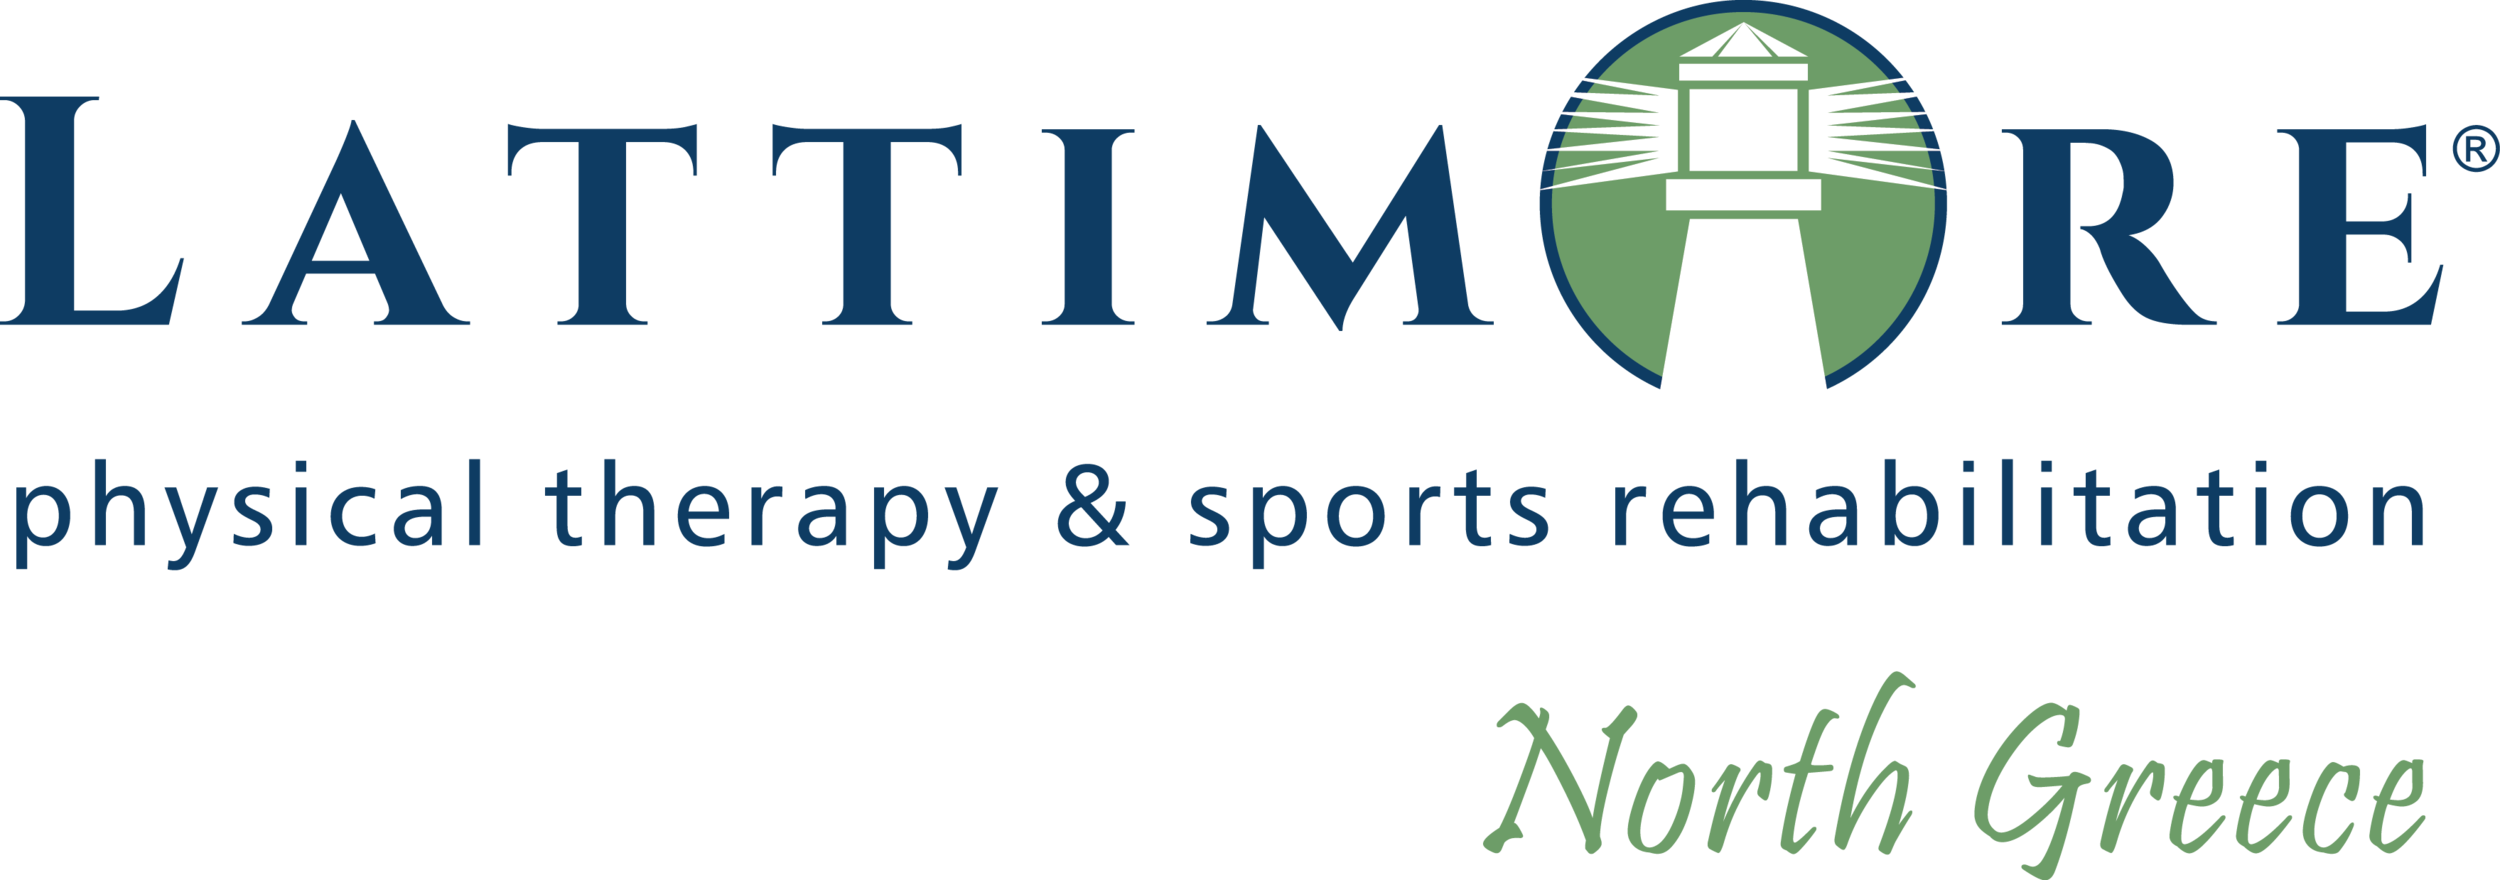 2019-05_Lattimore-Logo-NorthGreece.png